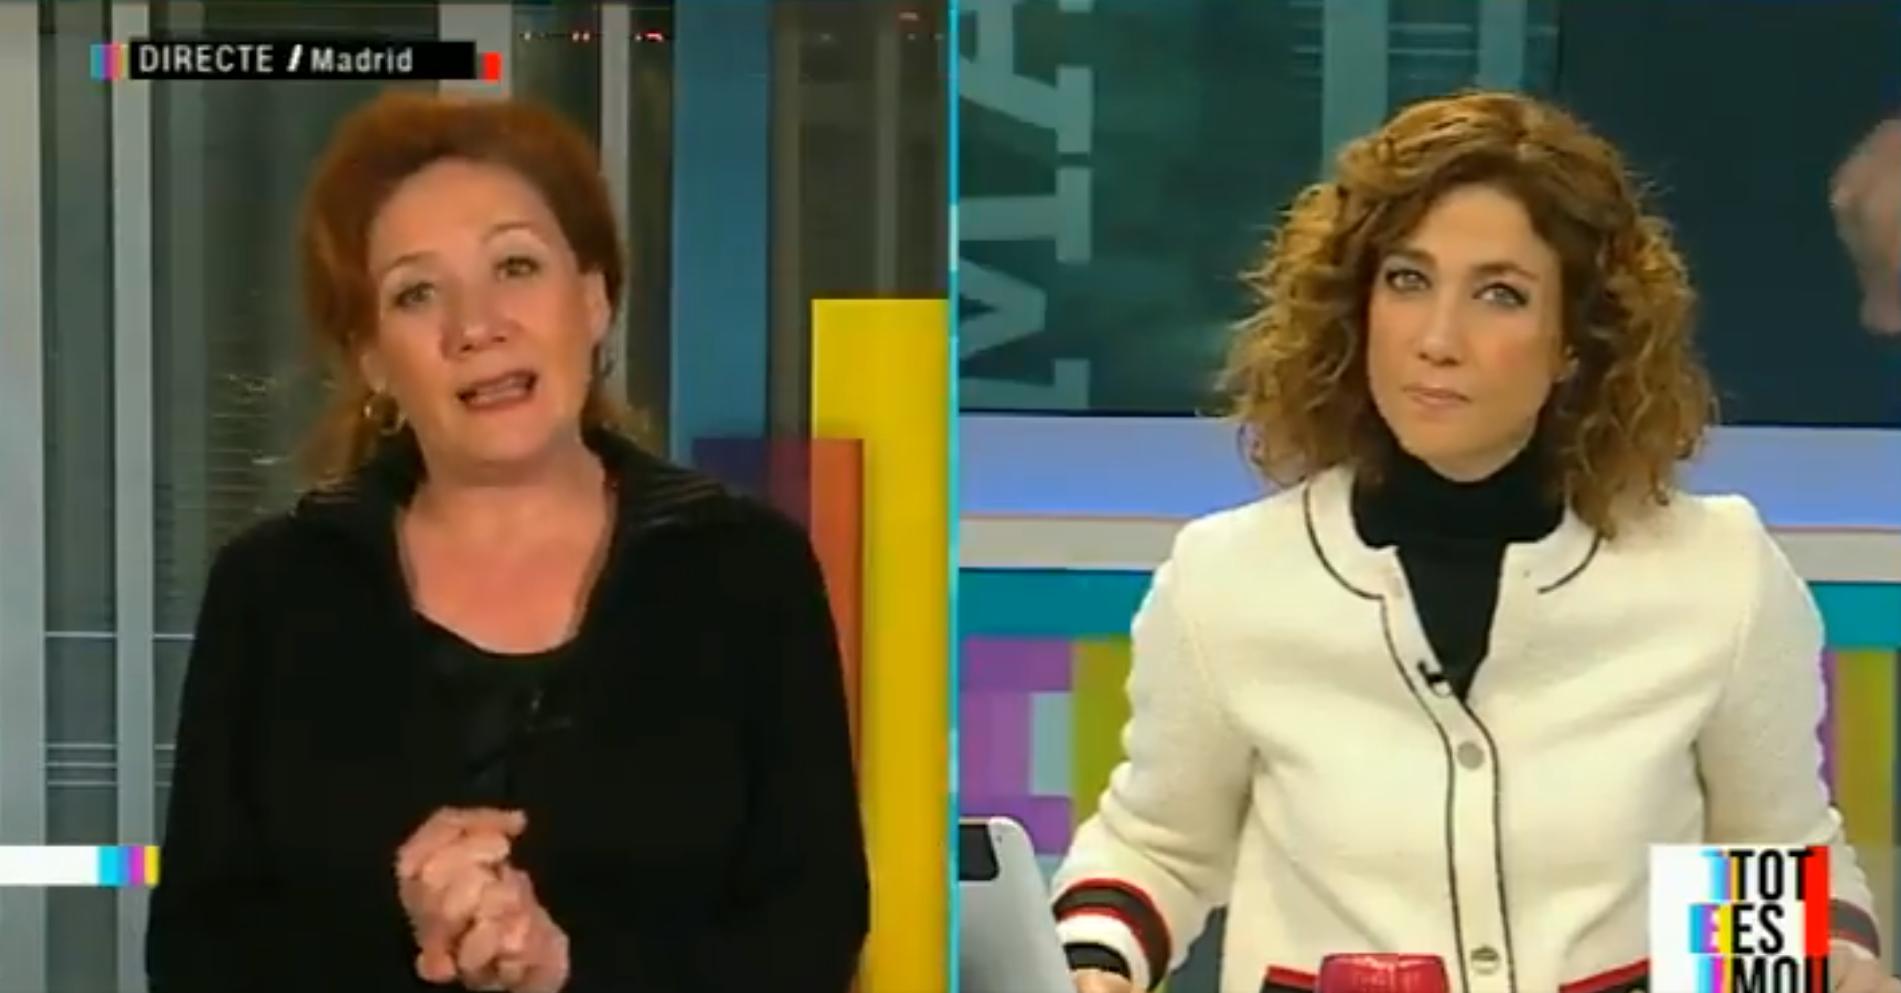 Cristina Fallarás Tot es mou tv3